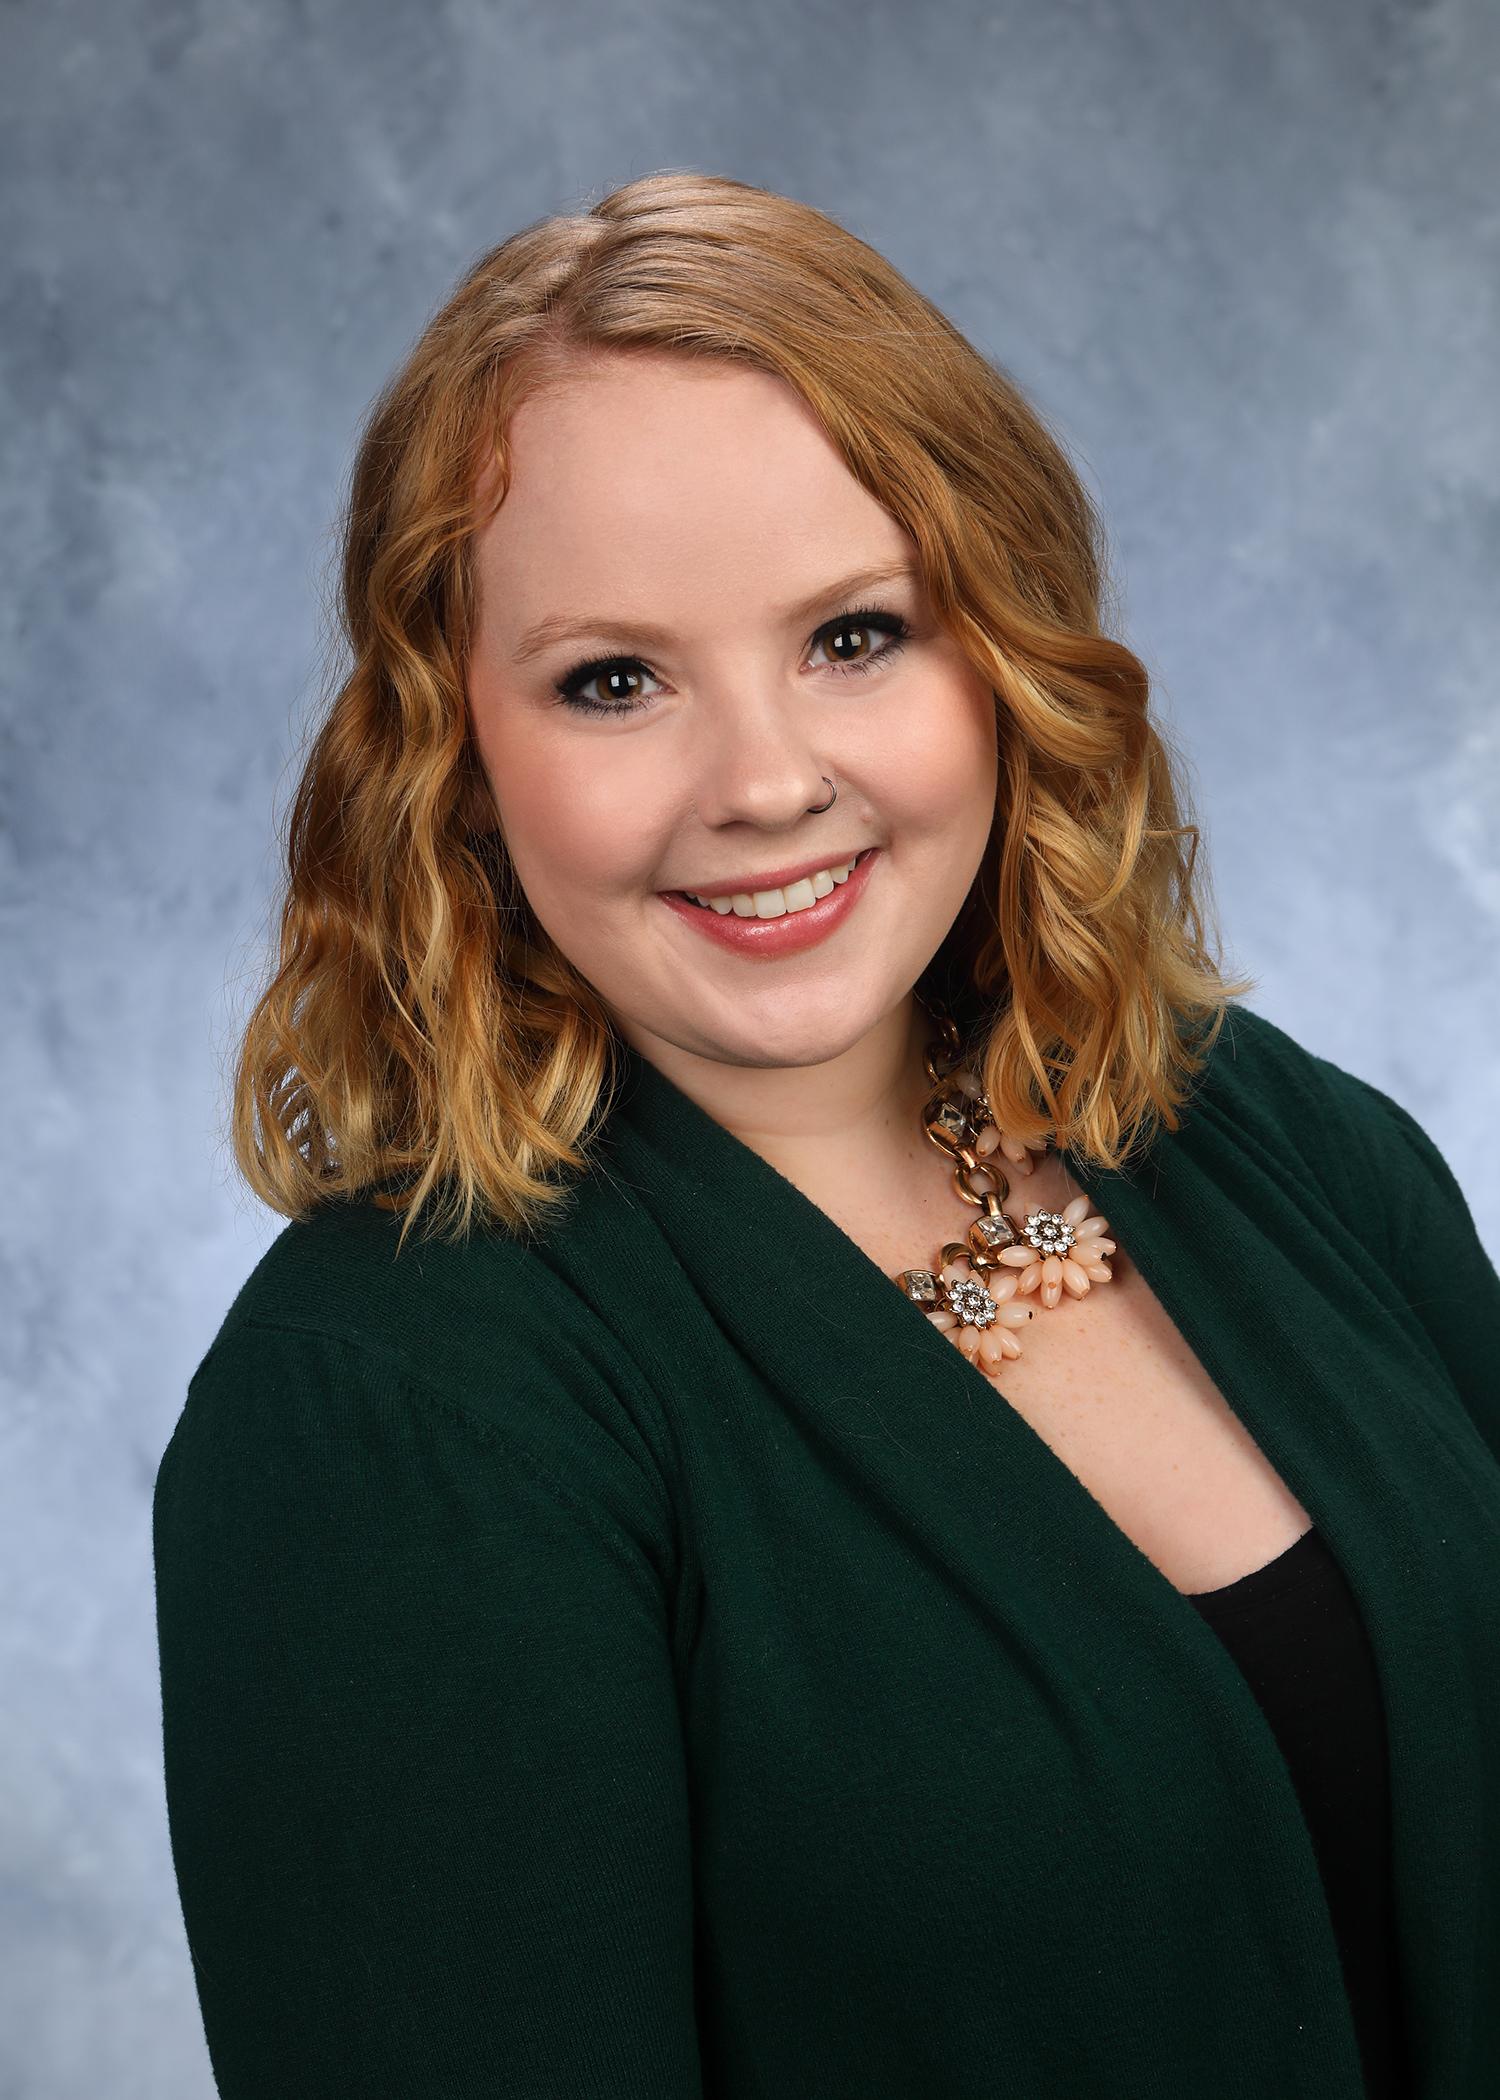 Headshot of Carly Tate, Vice President of Marketing and Development